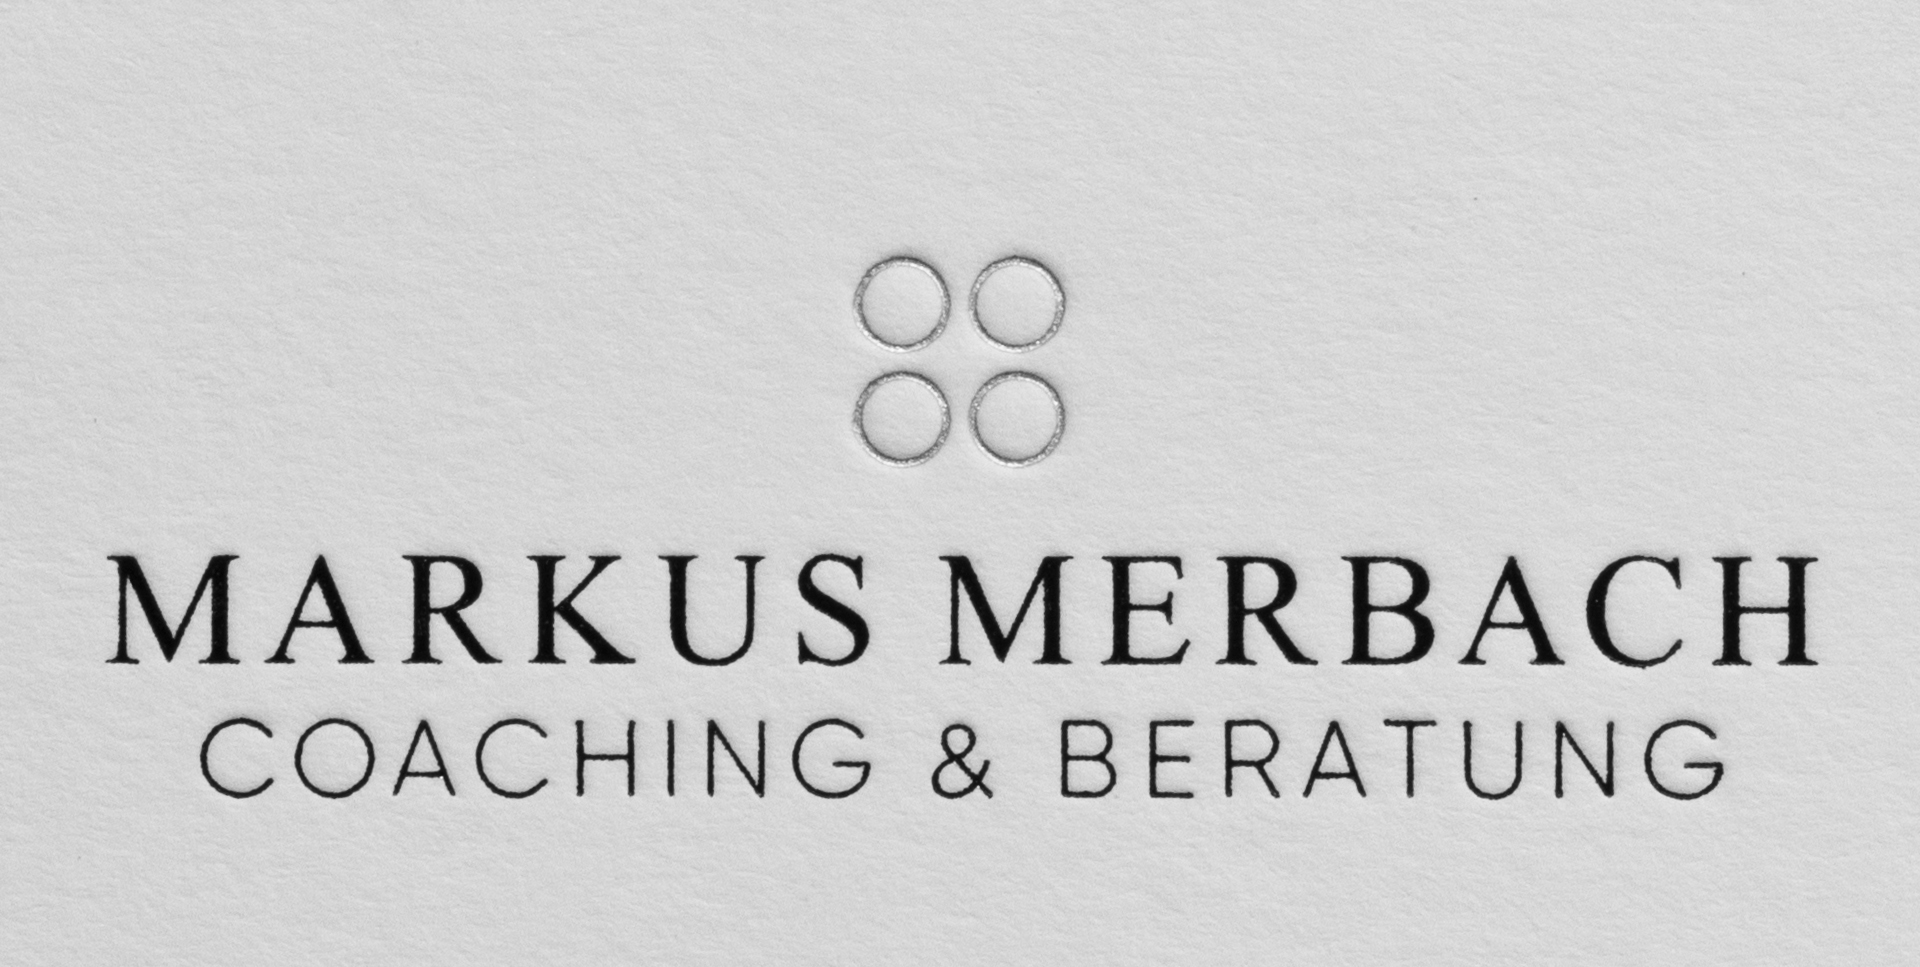 STUDIO-MUNIQUE-MARKUS-MERBACH-VISITENKARTE-2